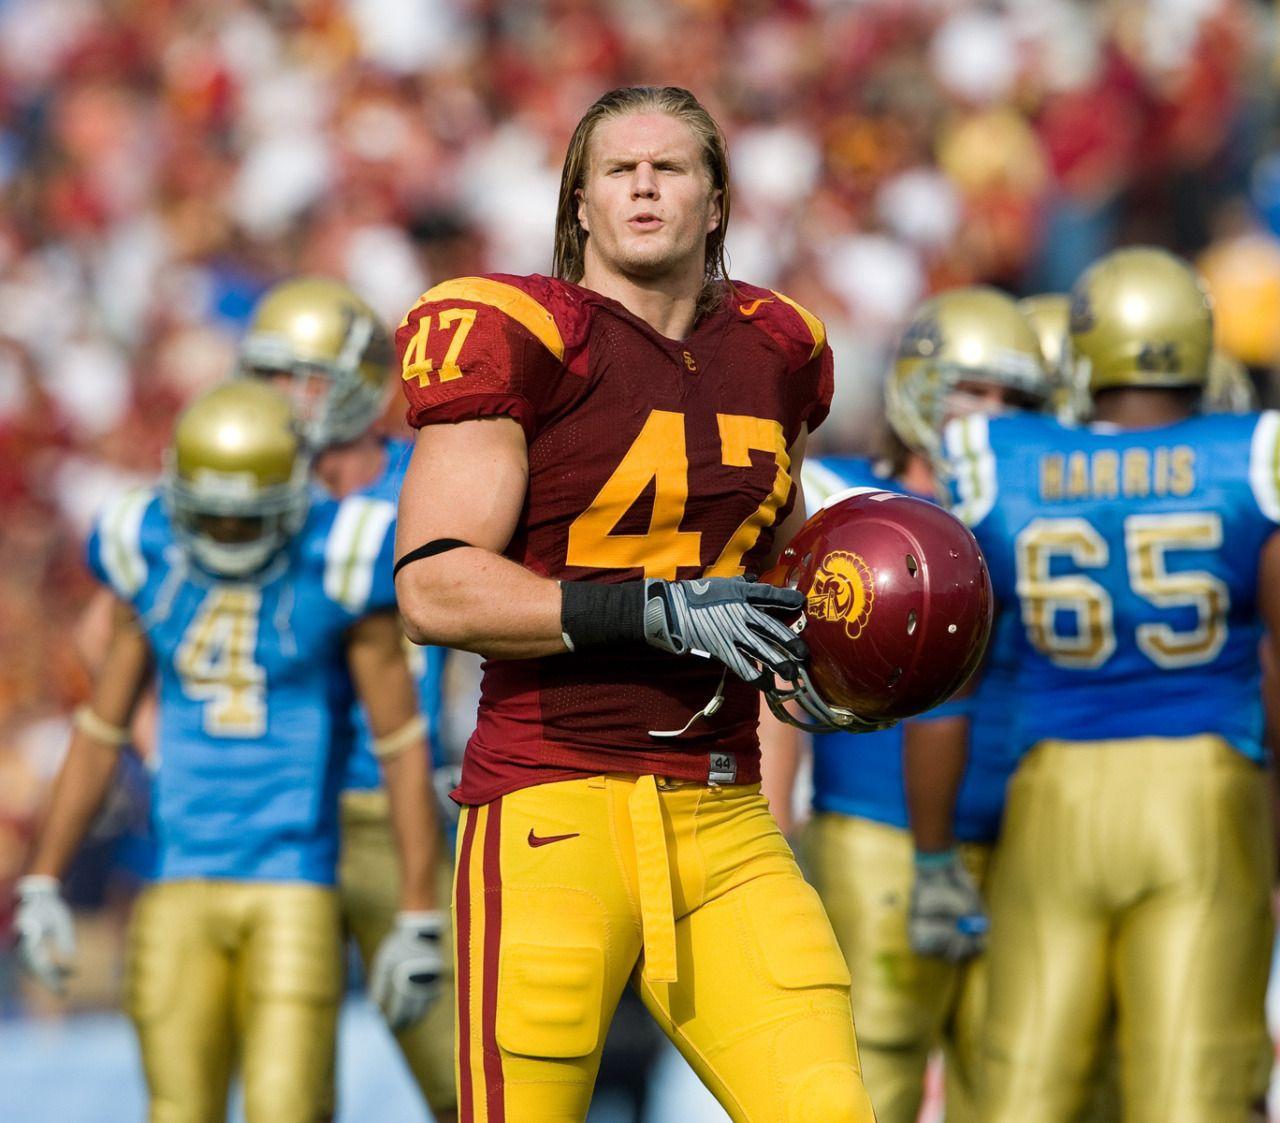 The College Football Blog Usc football, Usc trojans